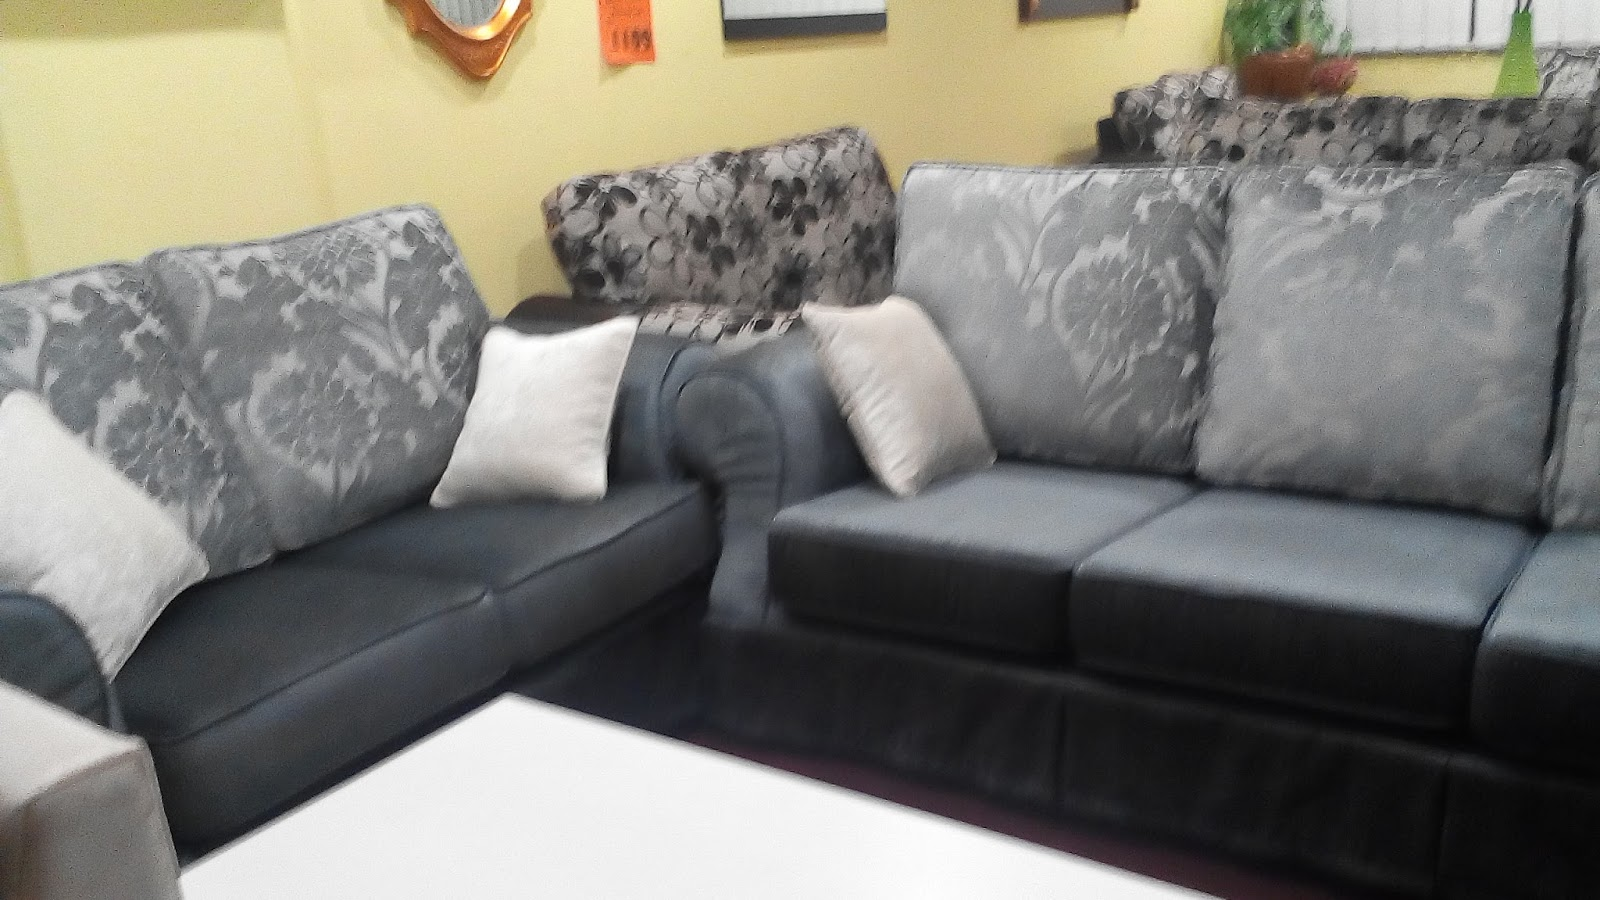 Lepas Bincang2 Pasal Budget Akhirnya Sofa Yang Bercorak Jugak Ni Kami Berkenan Dan Pilih Kaler Sebenarnya Silver And Gold